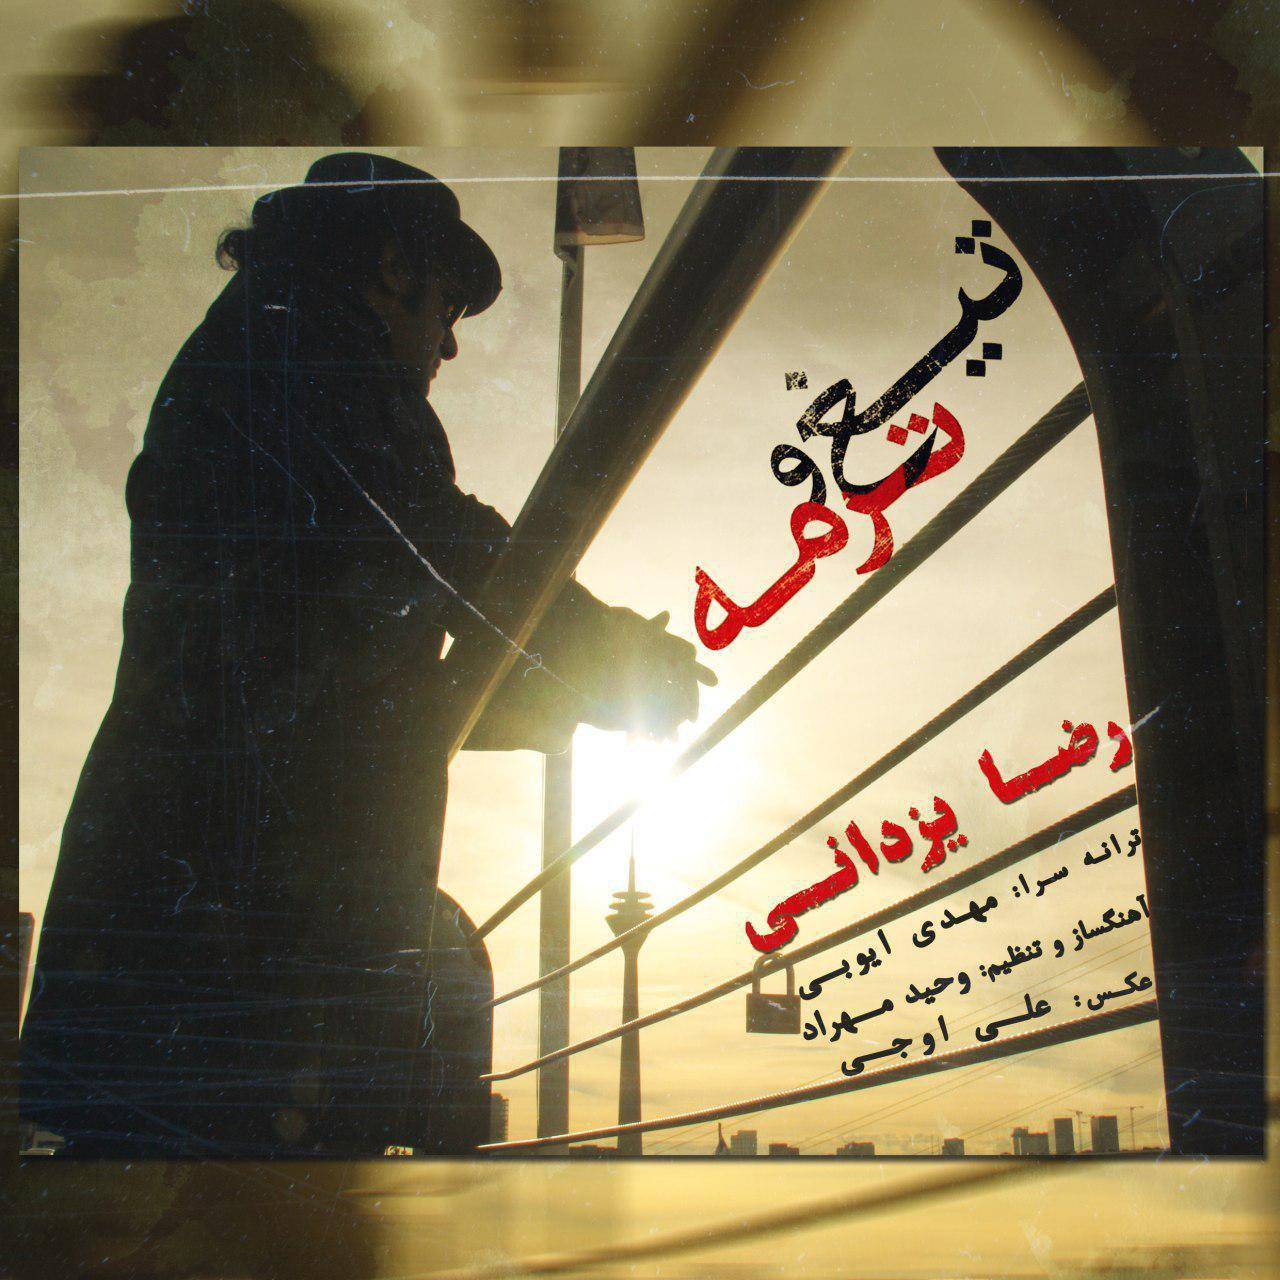 Reza Yazdani – Tigho Termeh